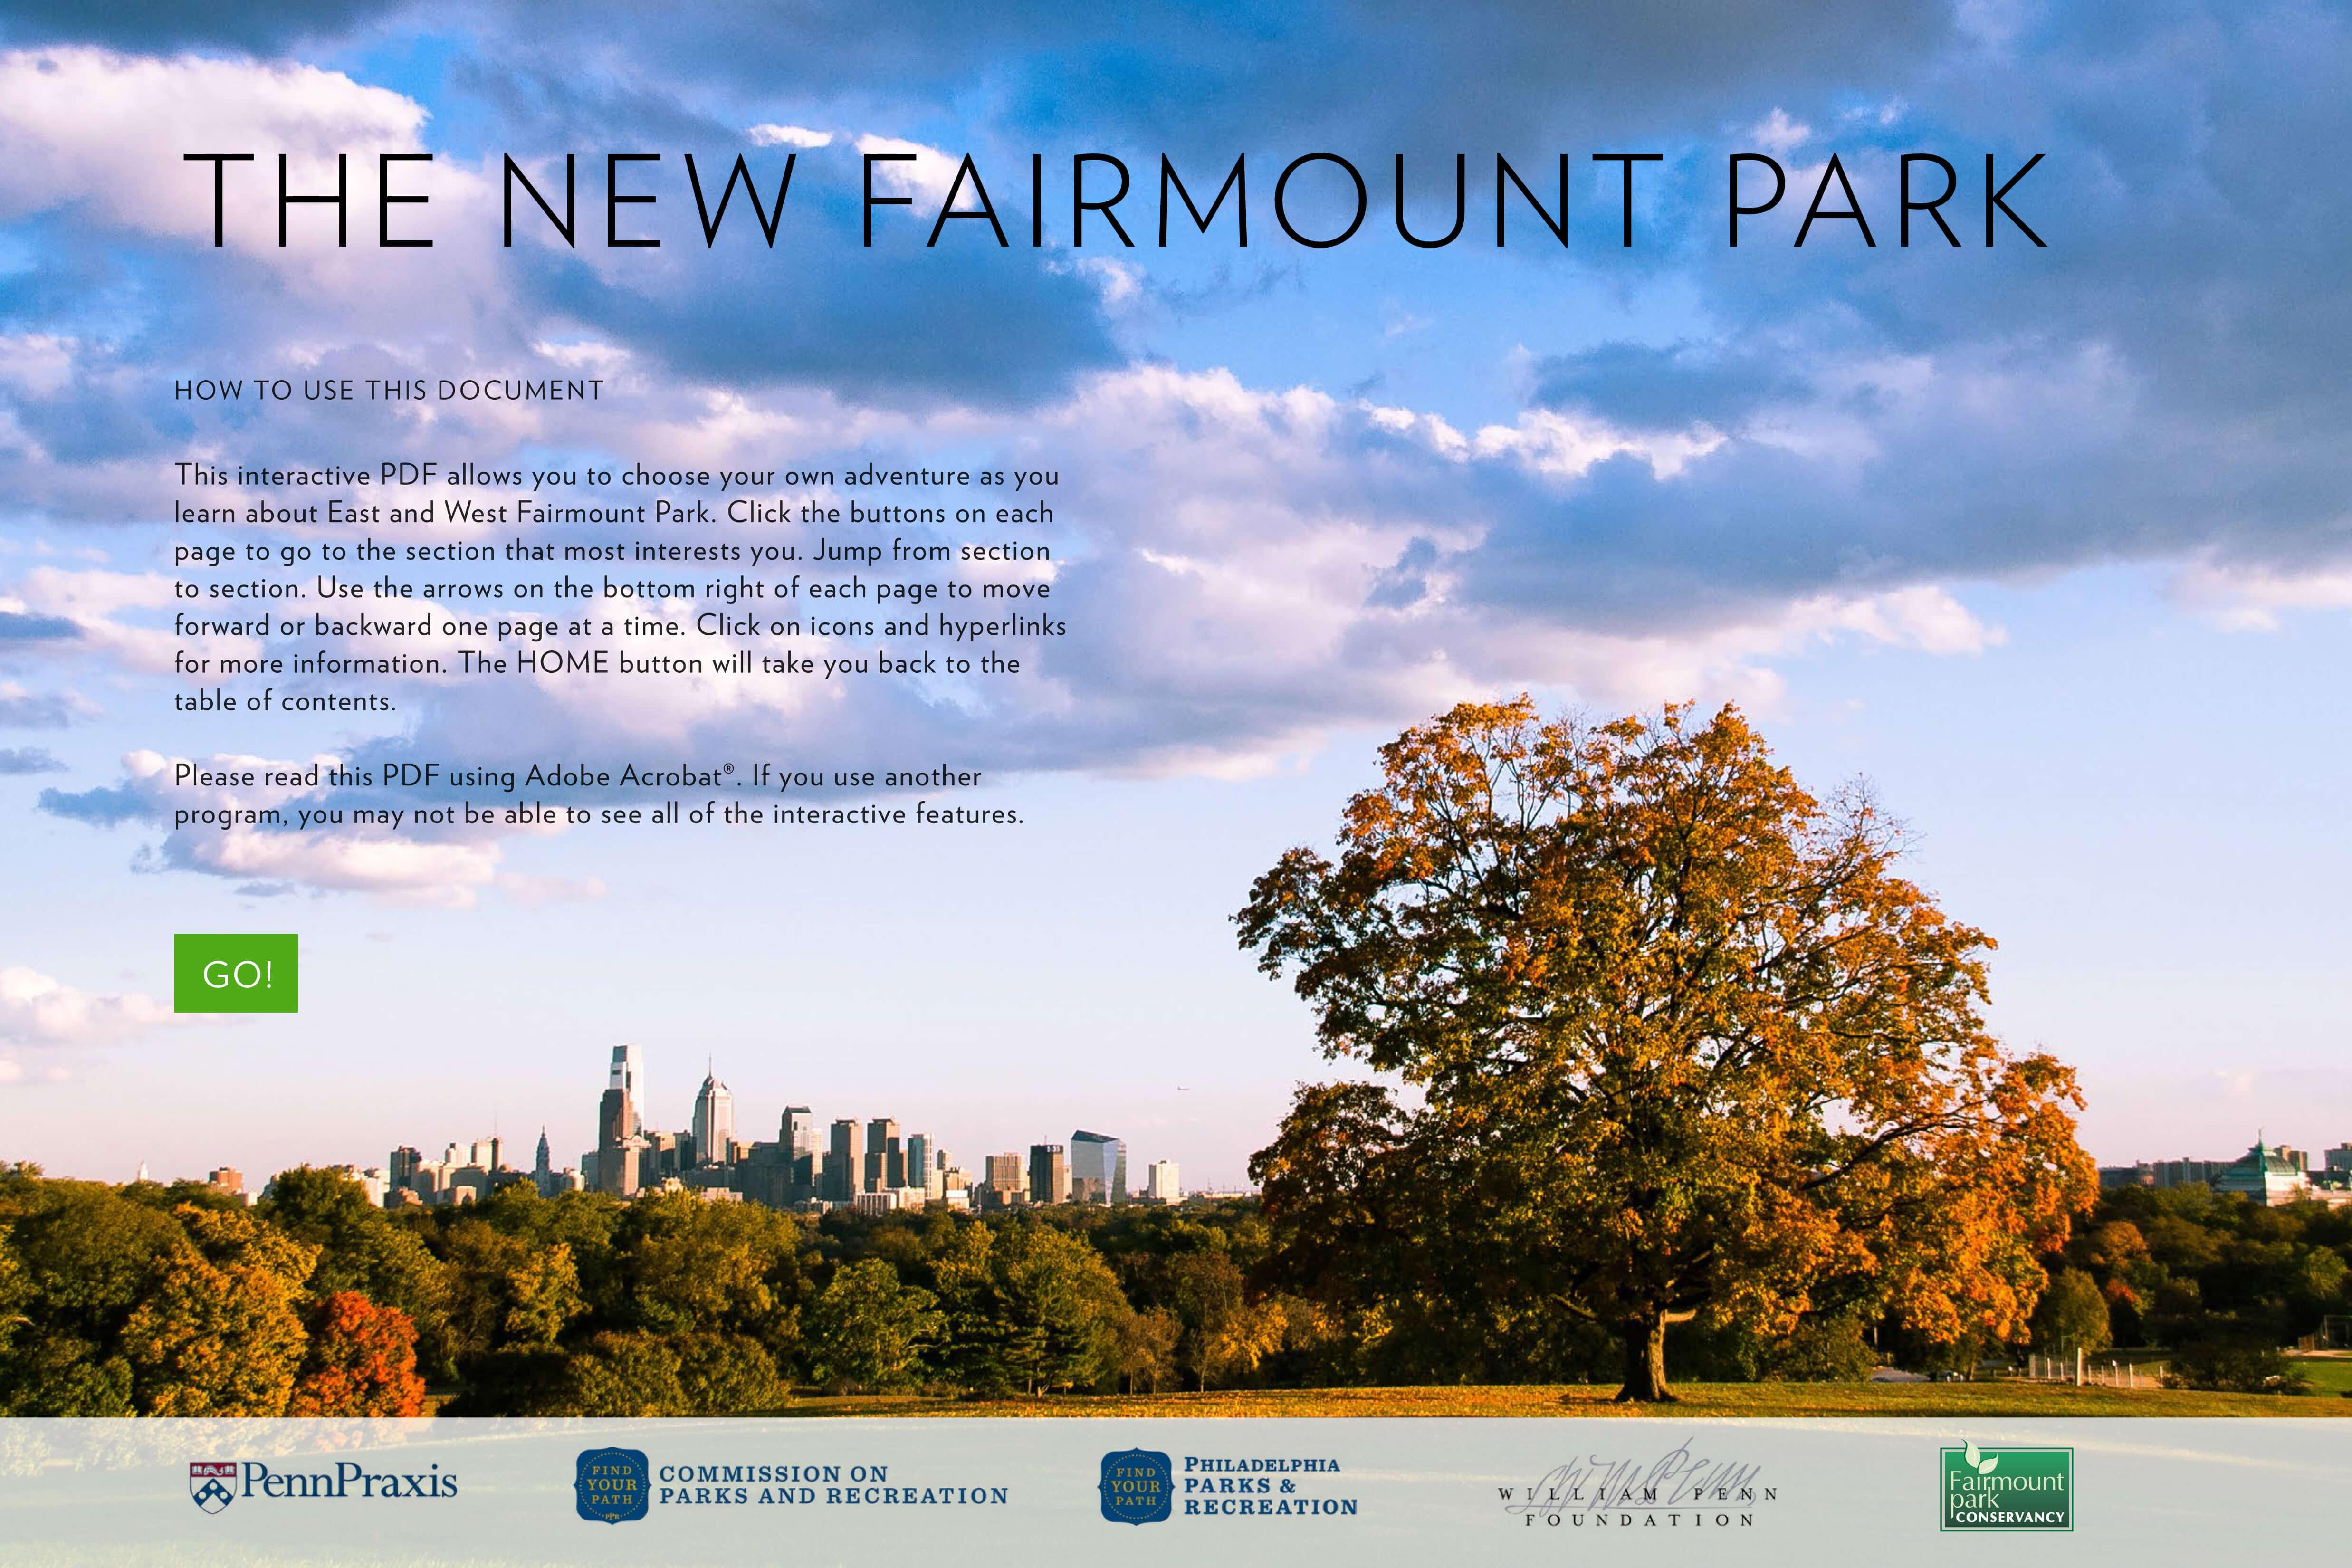 The New Fairmount Park Plan